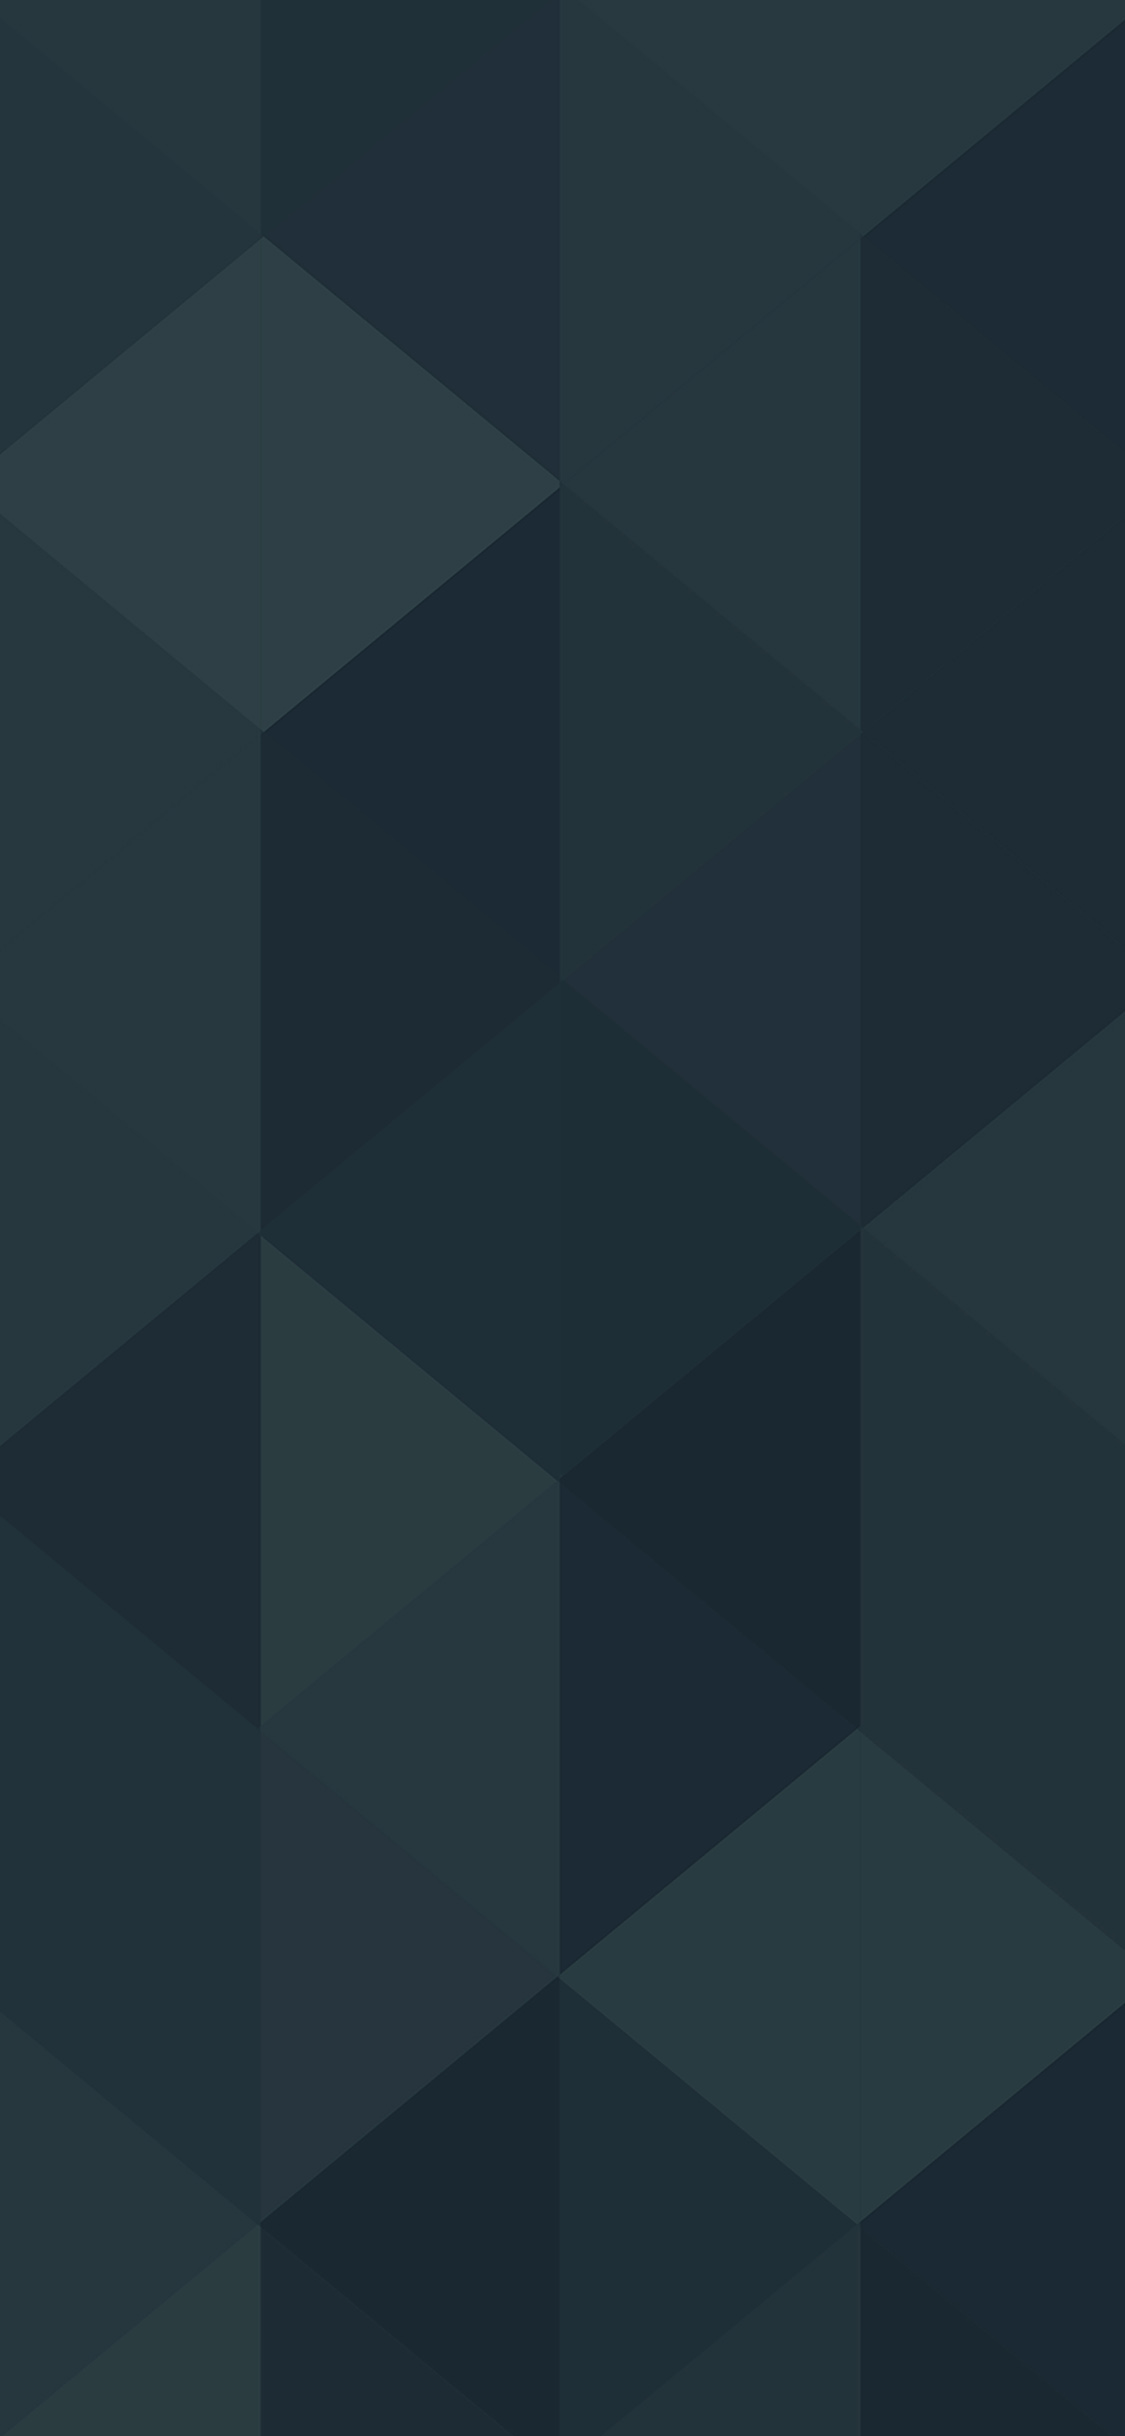 iPhonexpapers.com-Apple-iPhone-wallpaper-vq17-rectangle-dark-blue-art-pattern